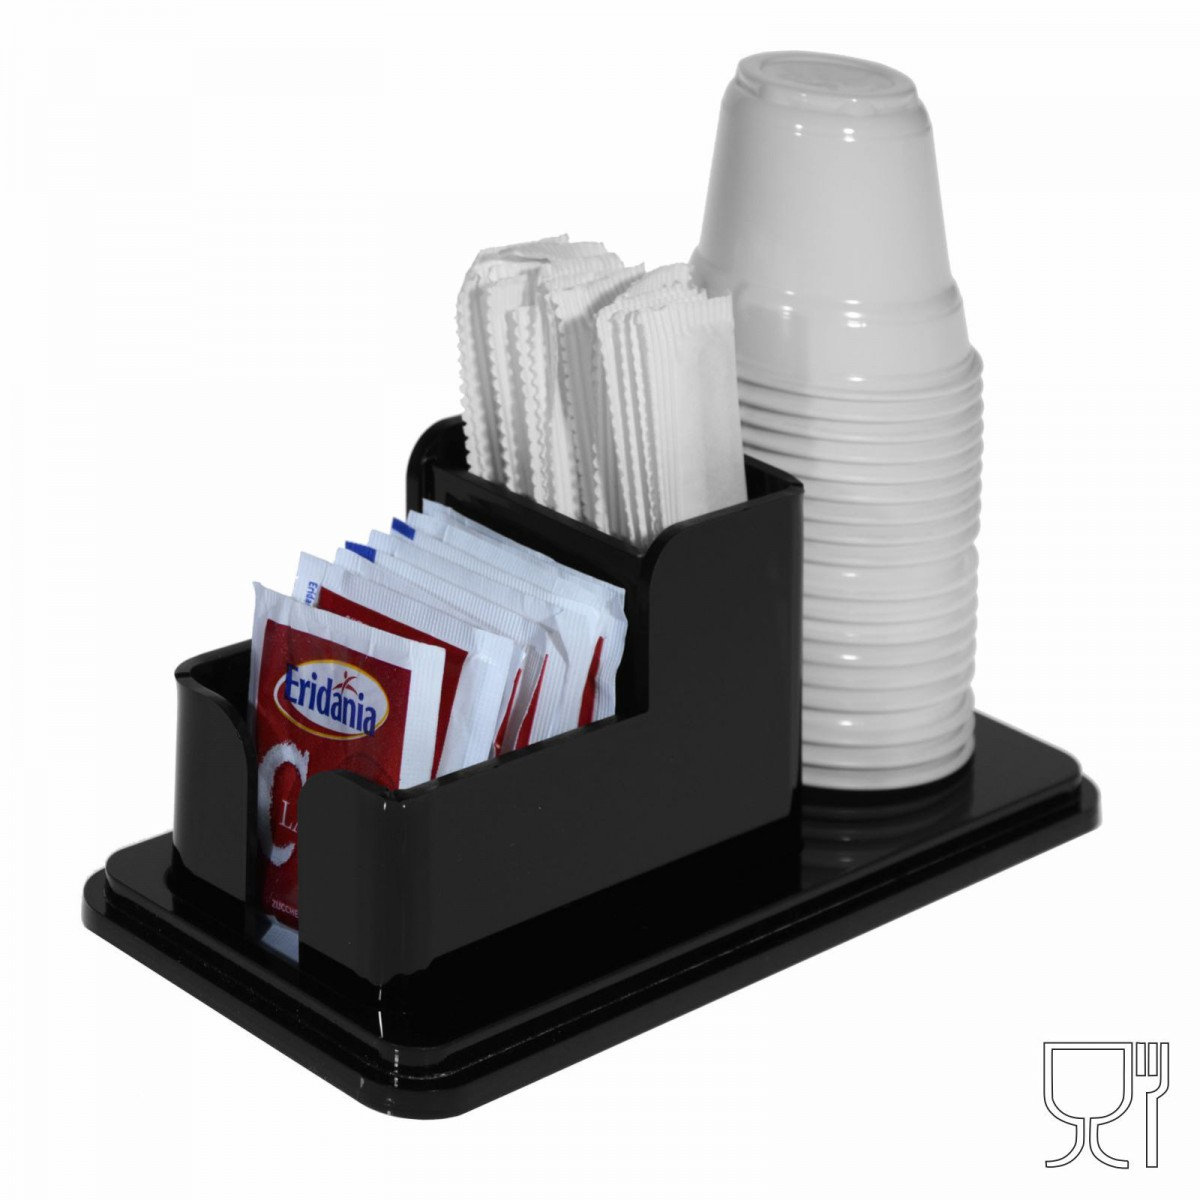 3-slot sugar packet, stir-stick and glass holder in black Plexiglass - CM(LxPxH): 18x8.5x7